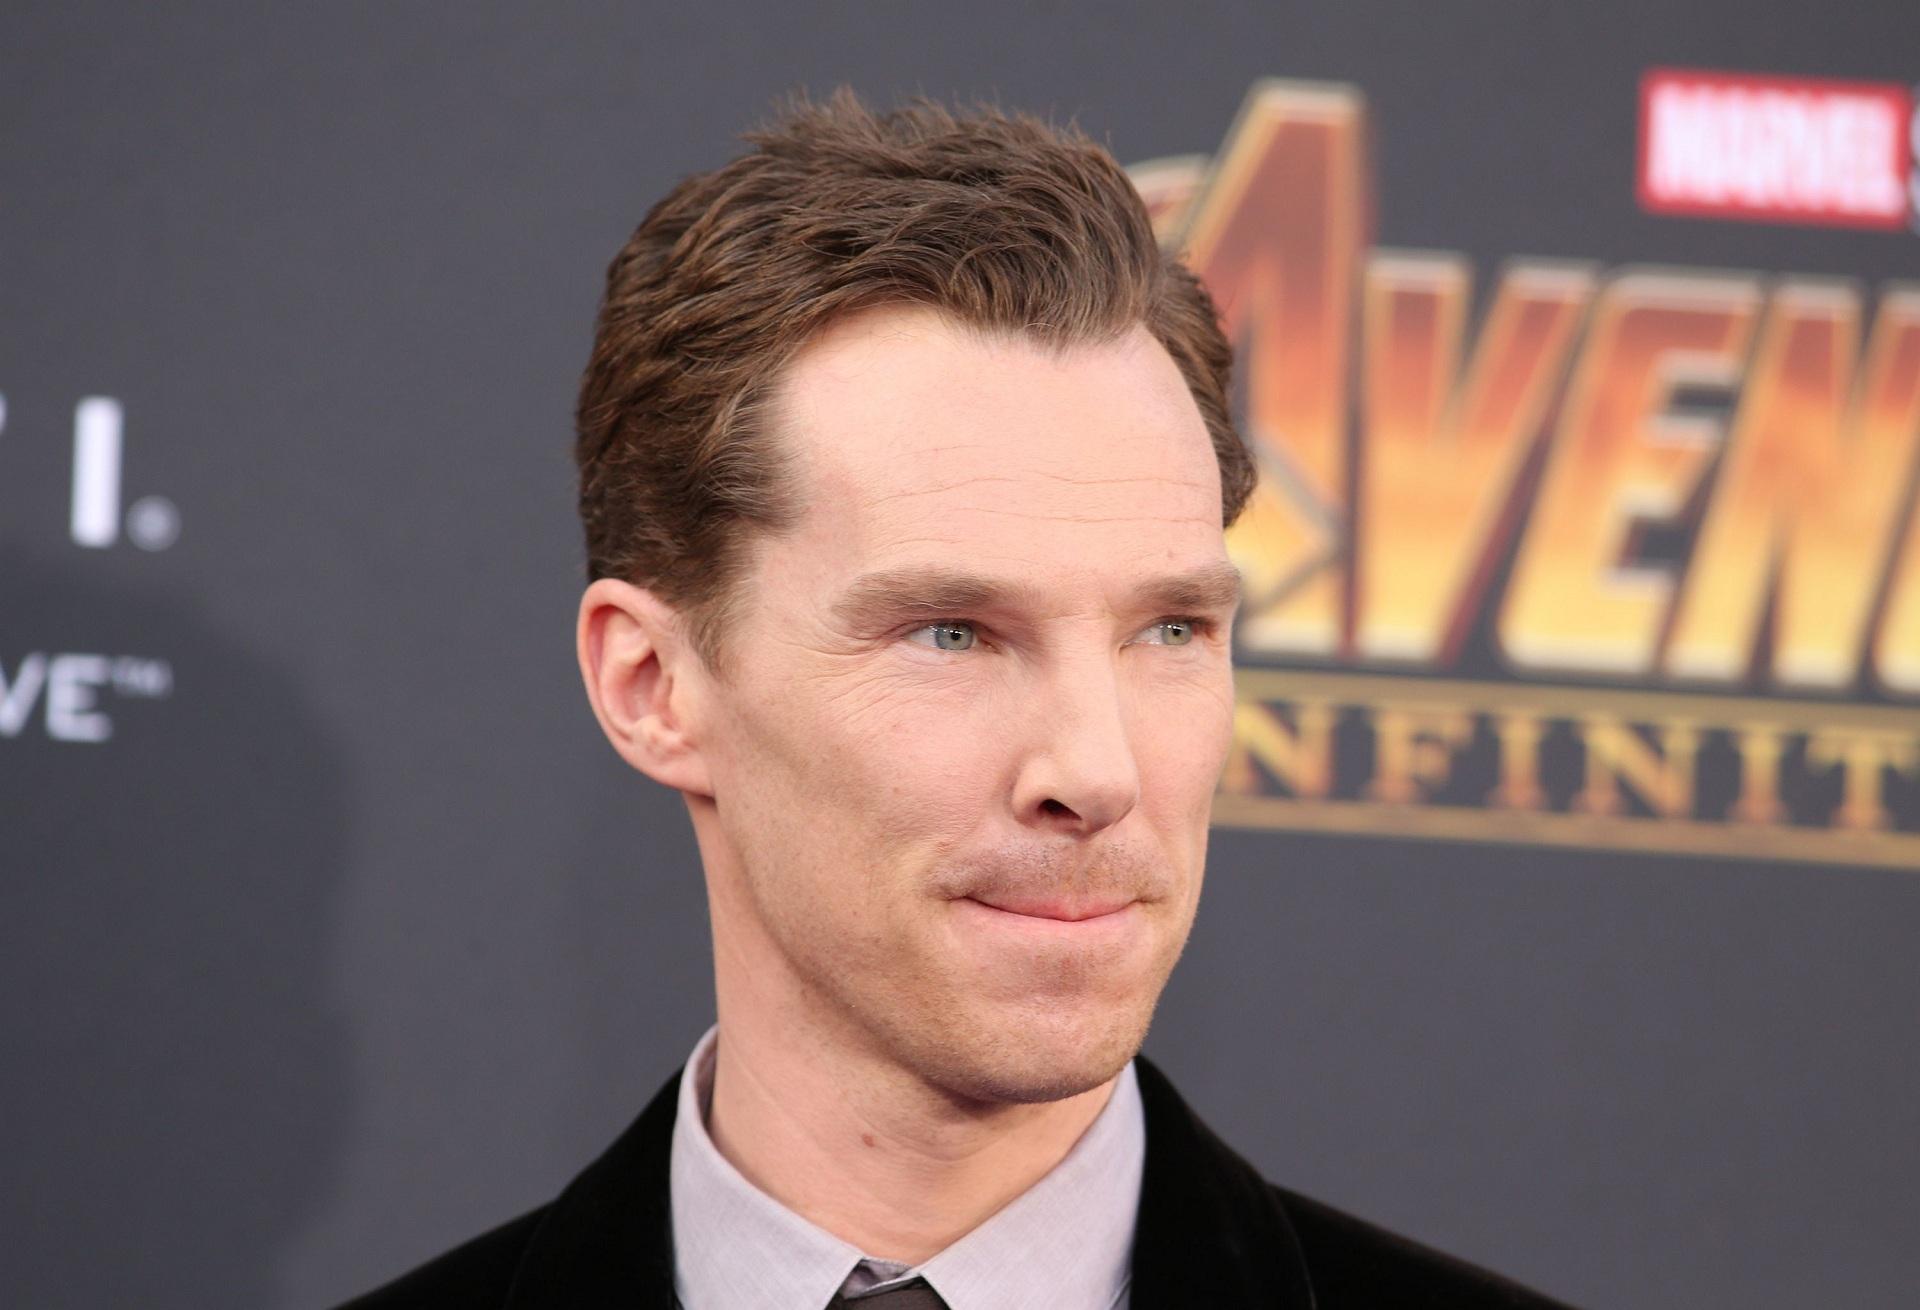 Benedict Cumberbatch Image - ID: 330848 - Image Abyss